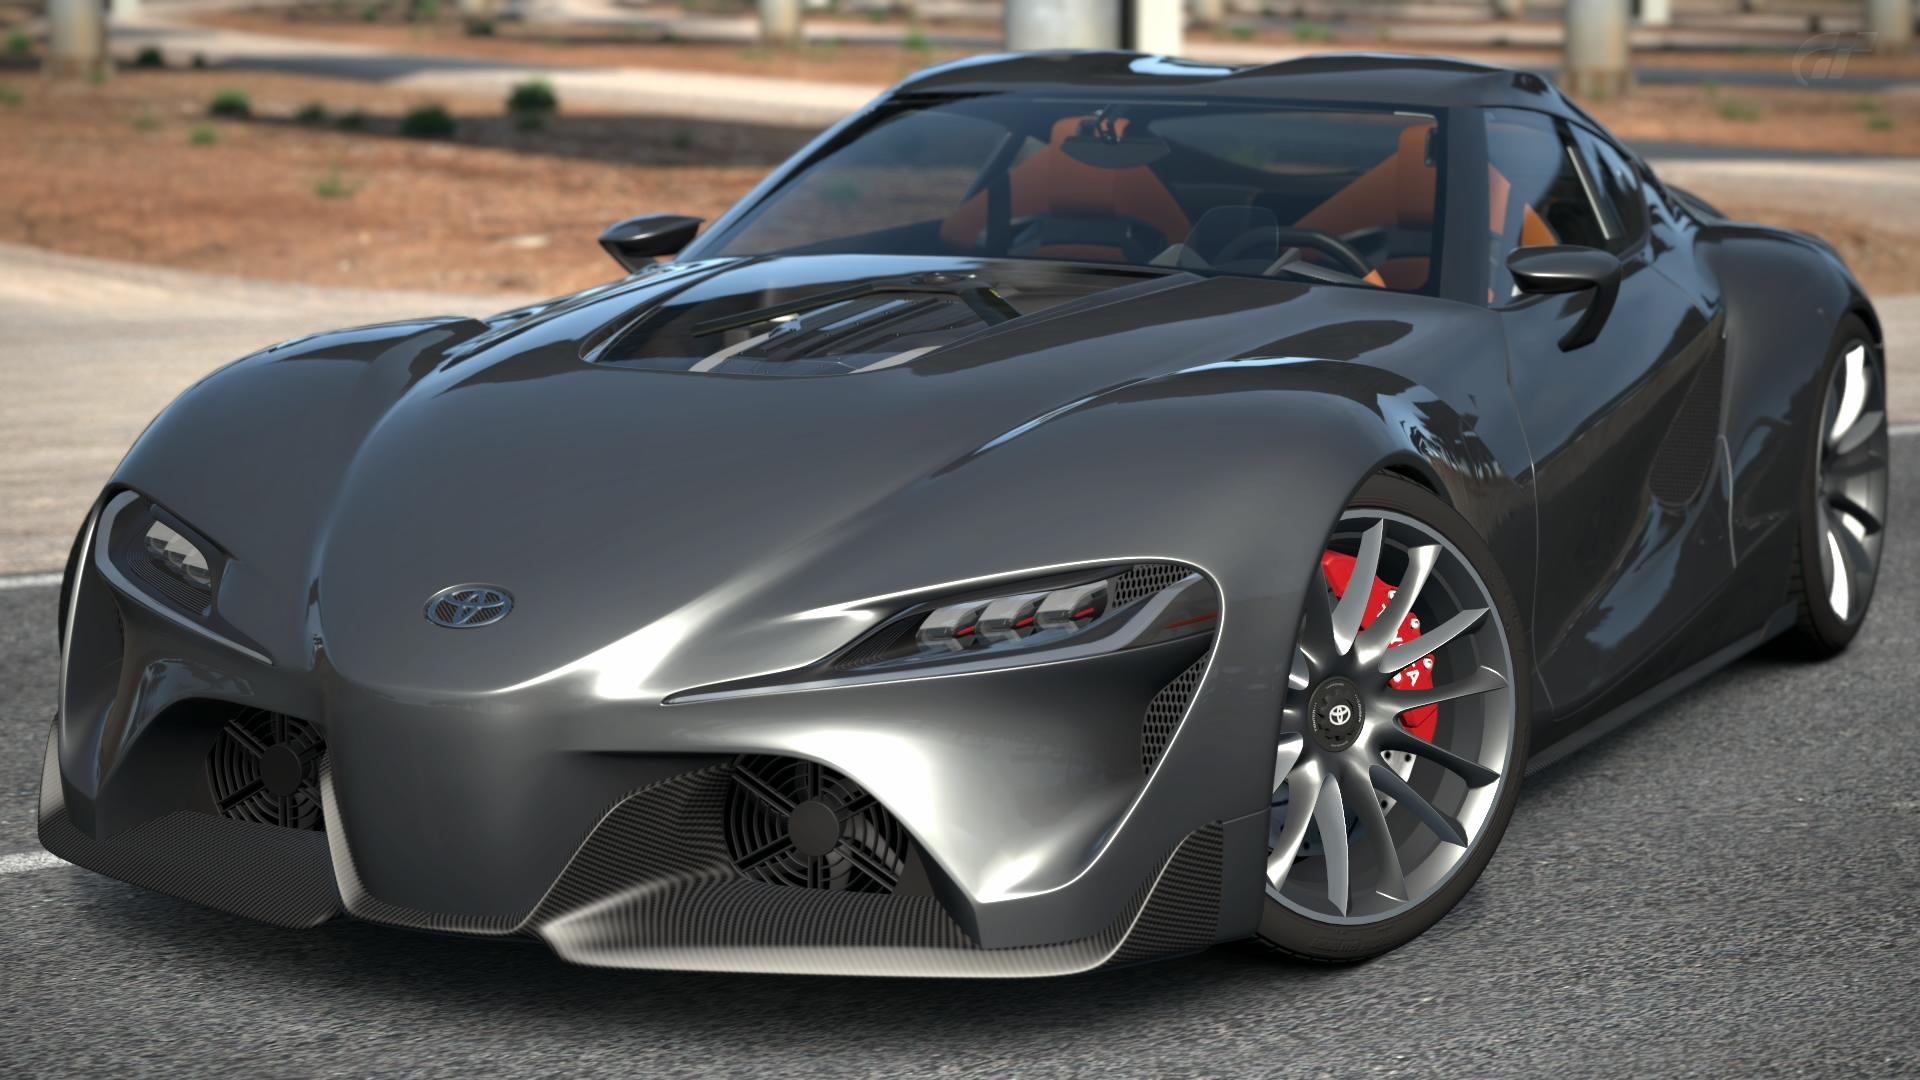 Toyota Ft 1 >> Toyota Ft 1 Graphite Gran Turismo Wiki Fandom Powered By Wikia